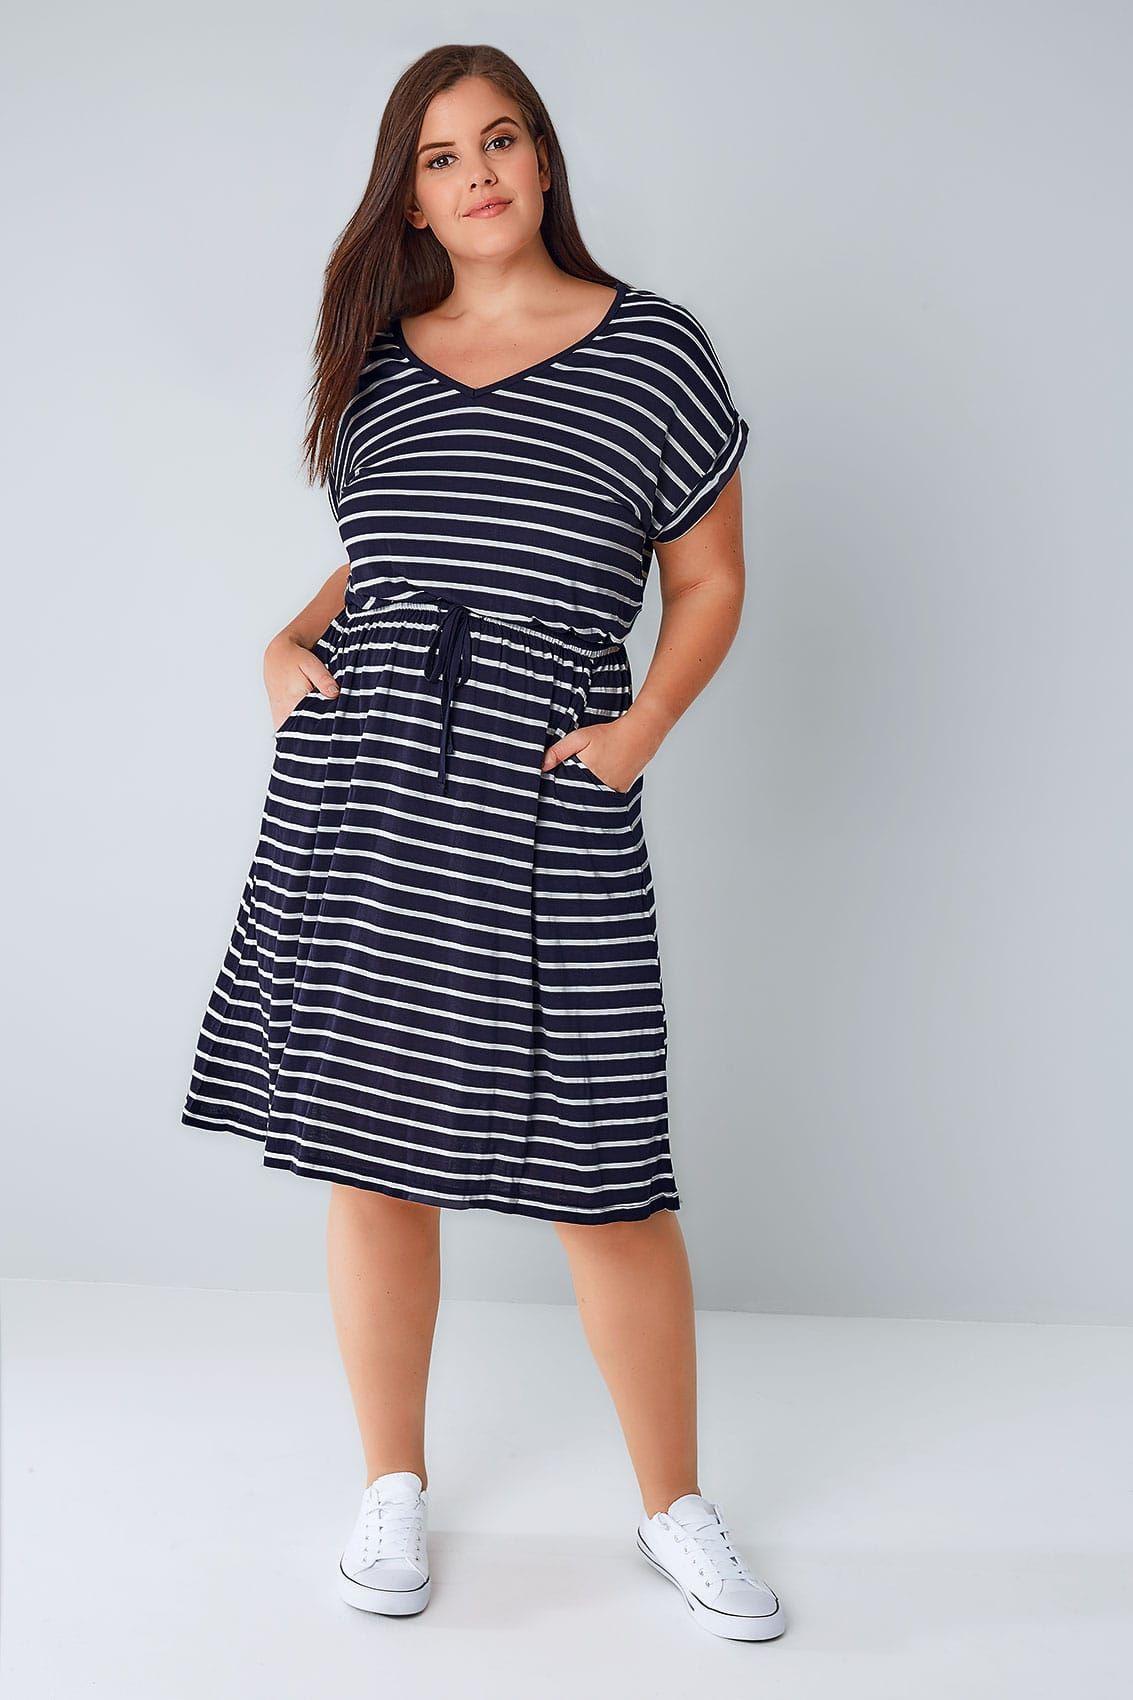 Navy White Stripe T Shirt Dress With Pockets Elasticated Waistband Maxi Dress Evening Glamorous Evening Dresses Striped T Shirt Dress [ 1700 x 1133 Pixel ]